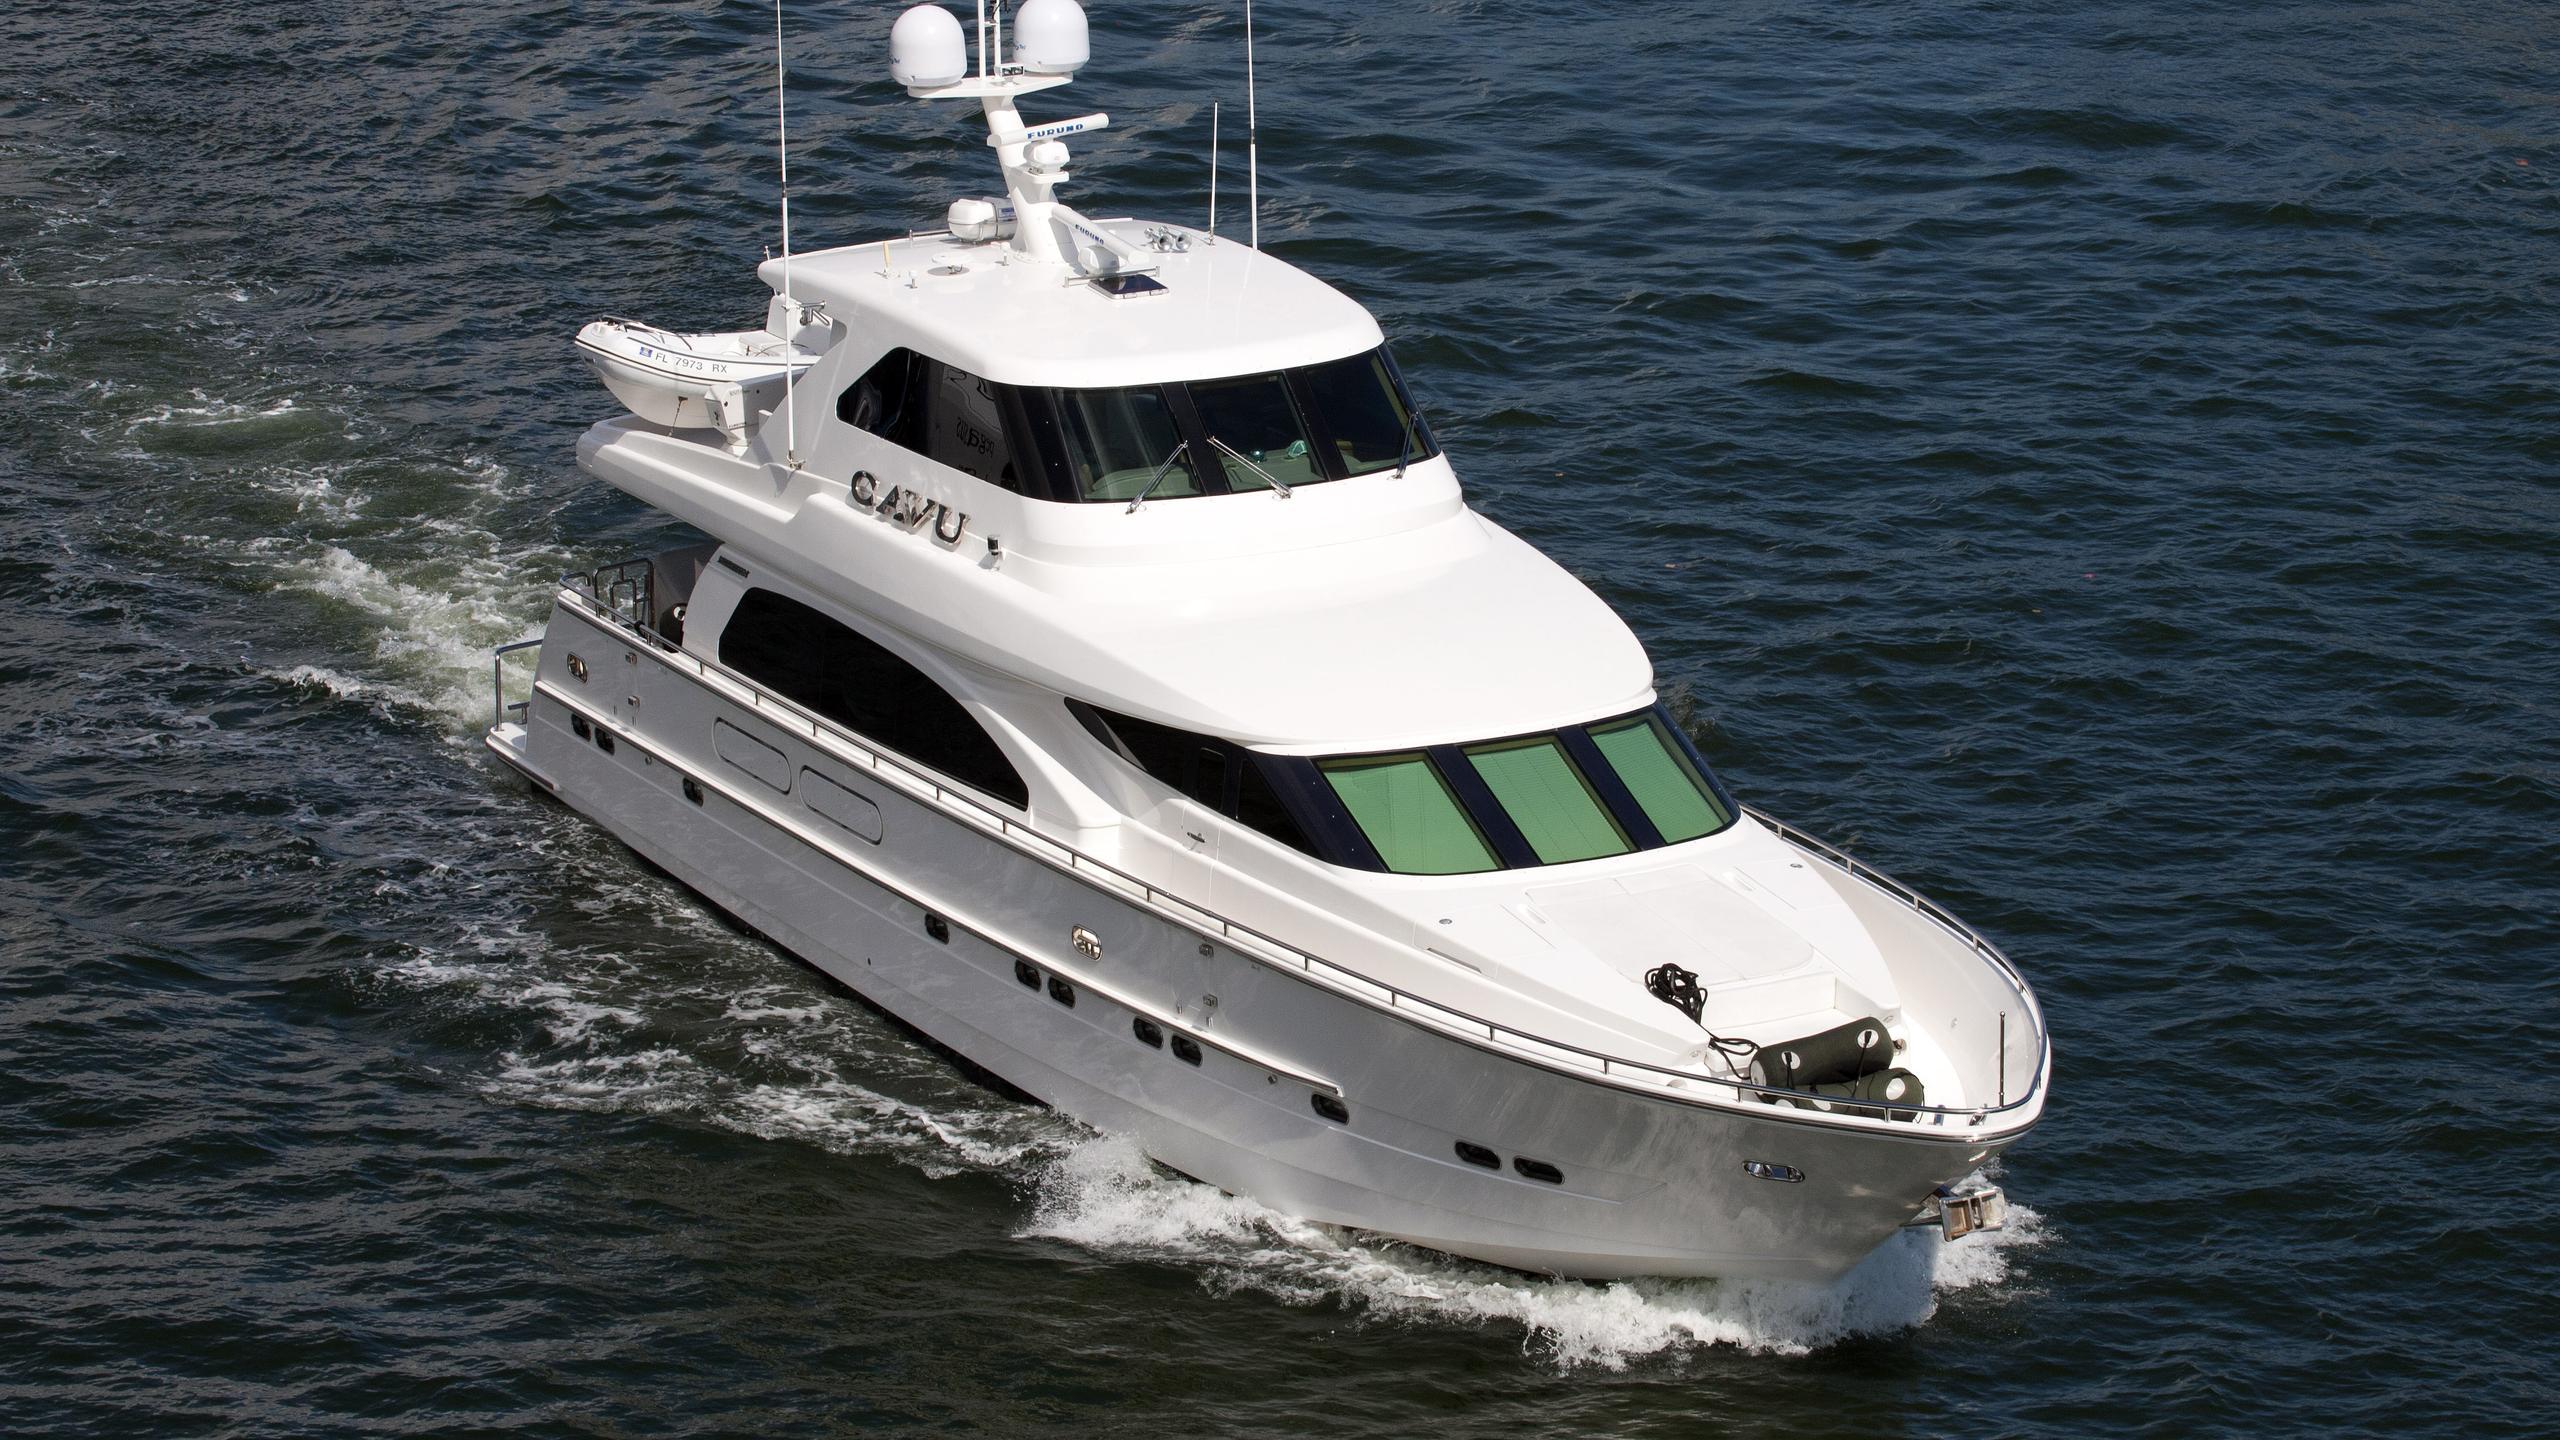 bella-mare-motor-yacht-horizon-78-2004-24m-aerial